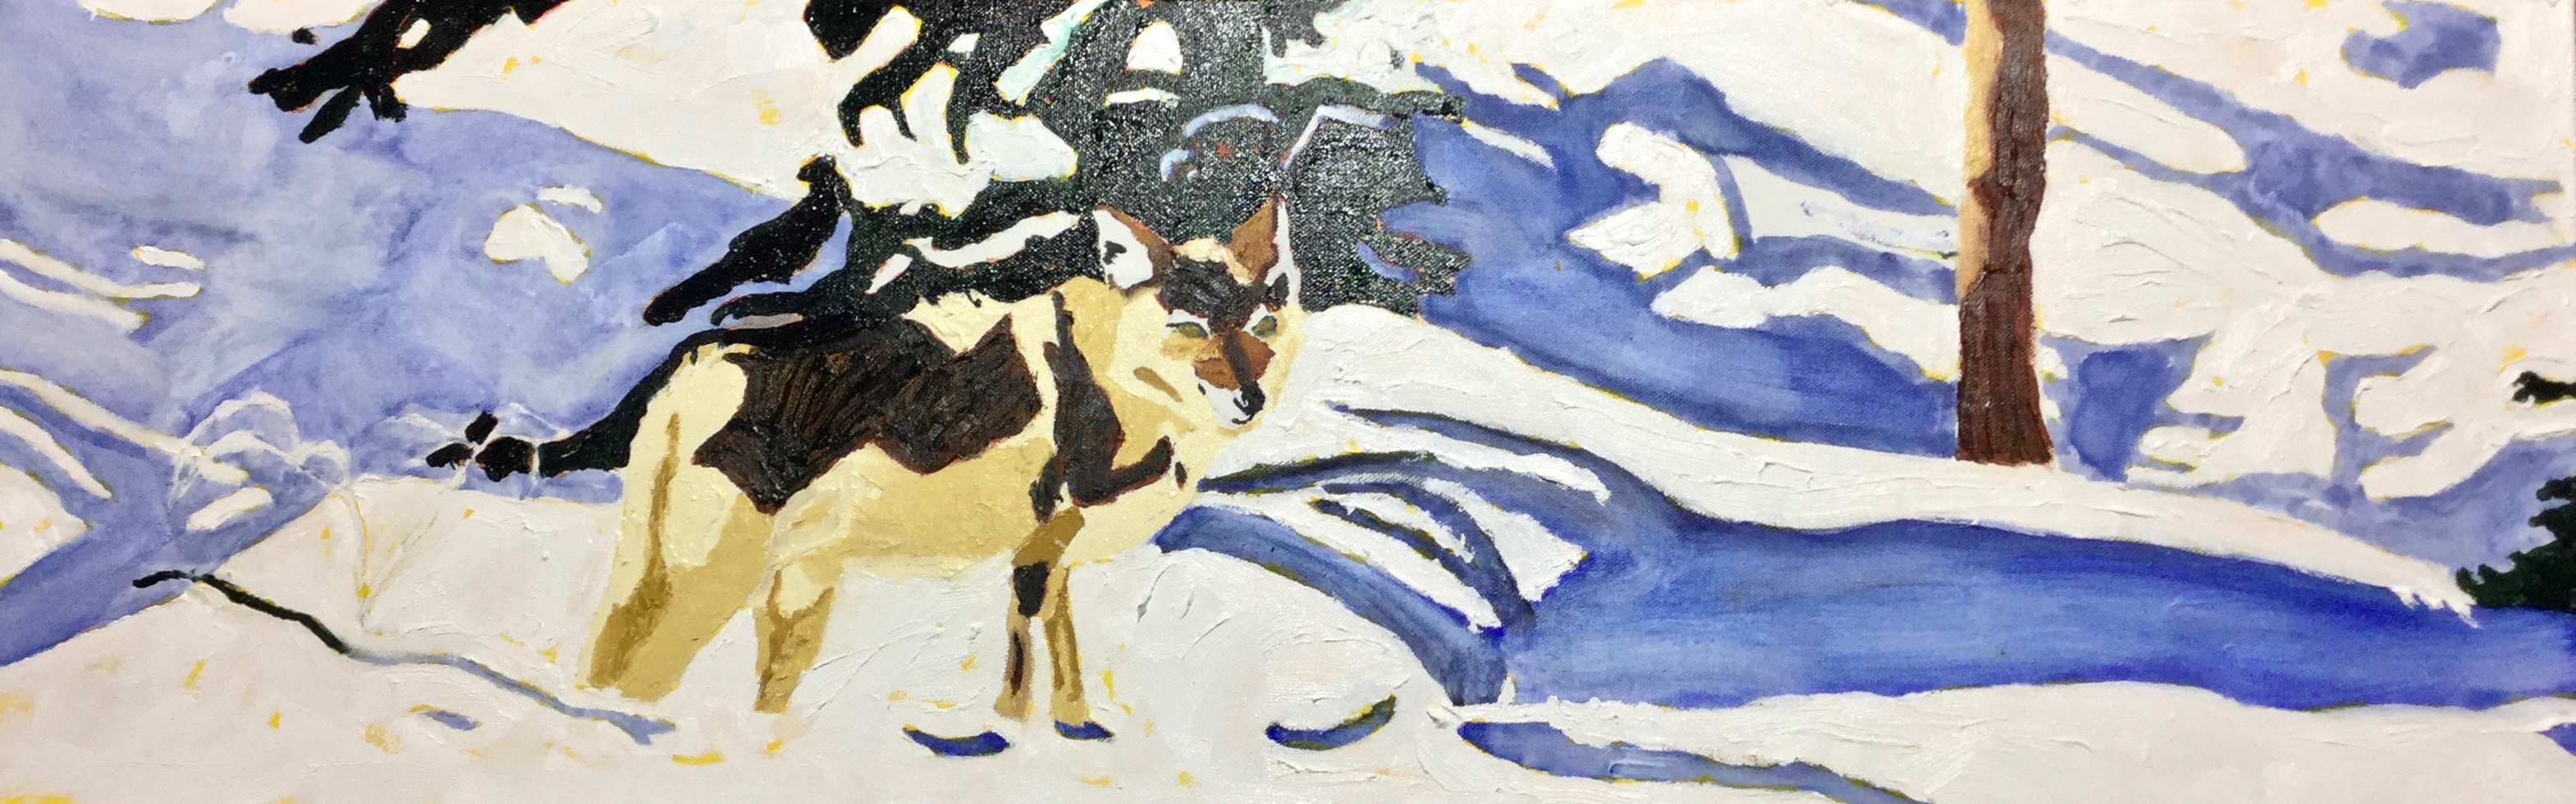 Cascade Shores Coyote= Pasquale